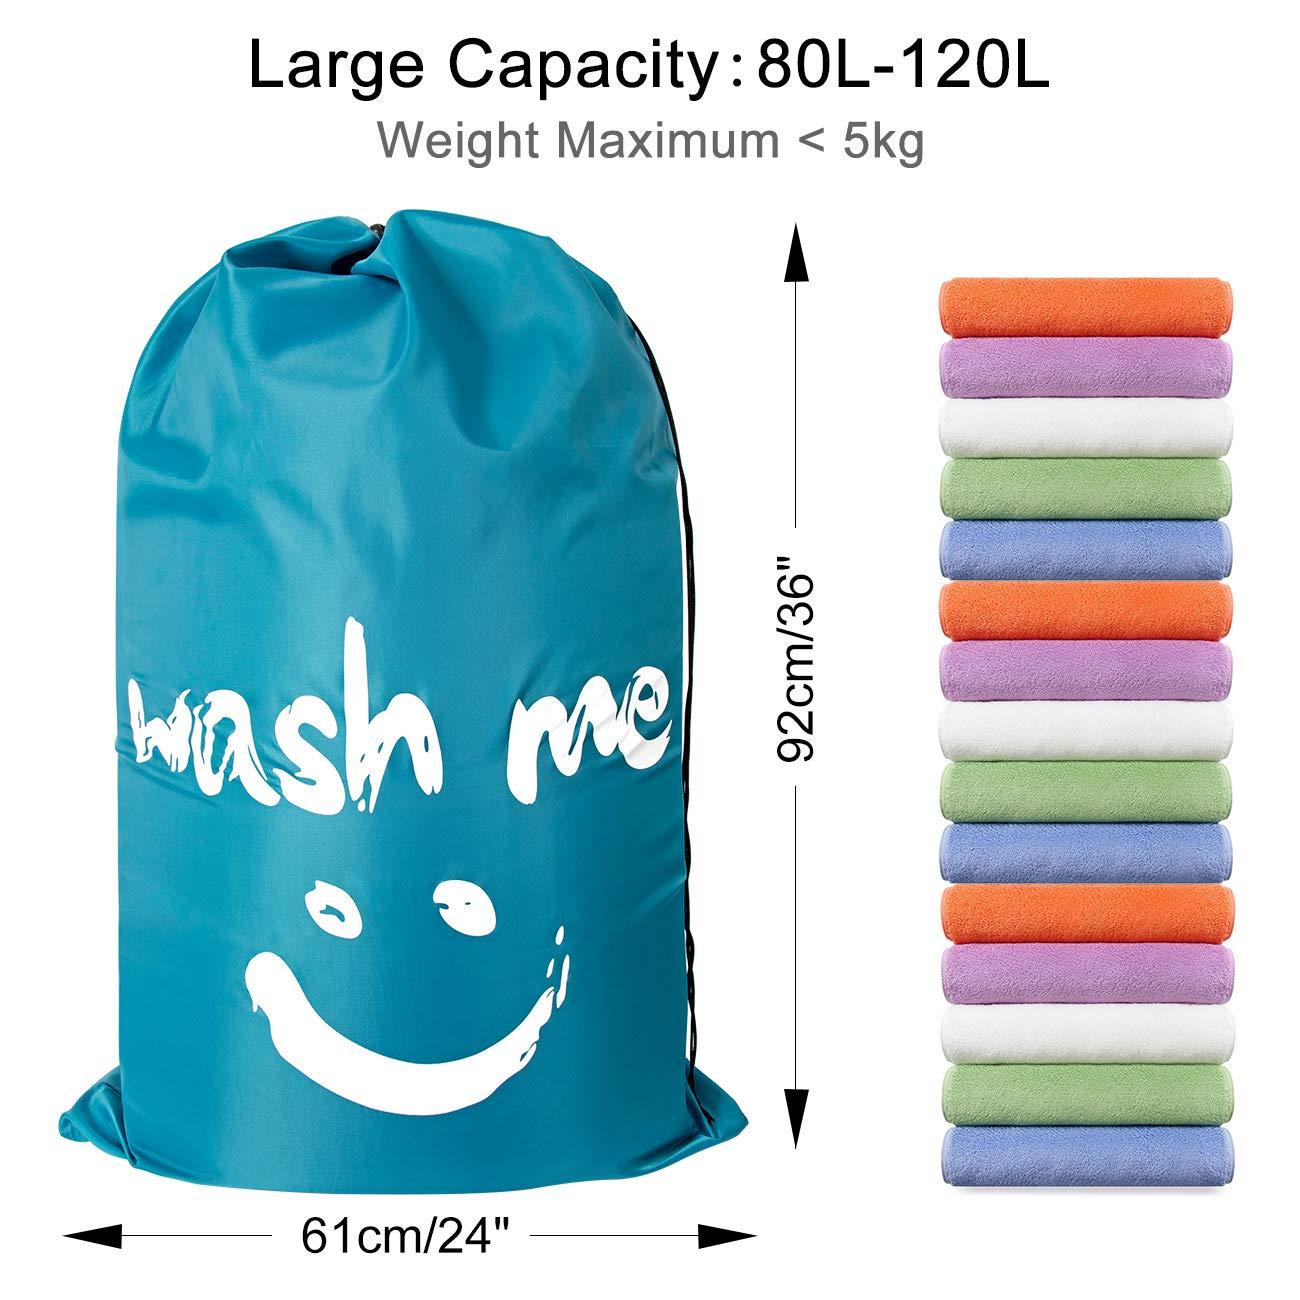 ZERO JET LAG 2 Pack Extra Large Travel Laundry Bag Set Nylon Rip-Stop Dirty Storage Bag Machine Washable Drawstring Closure 24'' x 36'' (Blue and Gray) by ZERO JET LAG (Image #3)